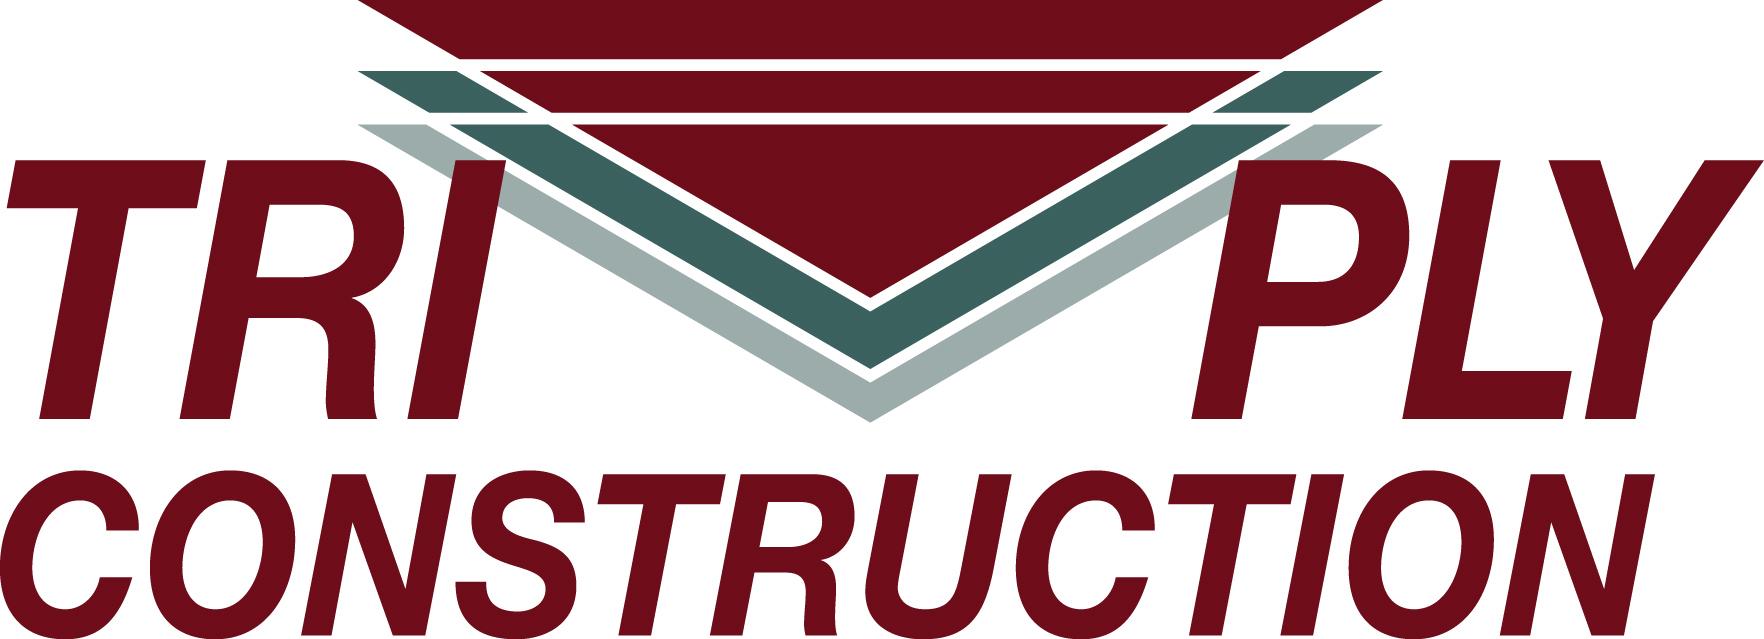 Tri-Ply Construction logo